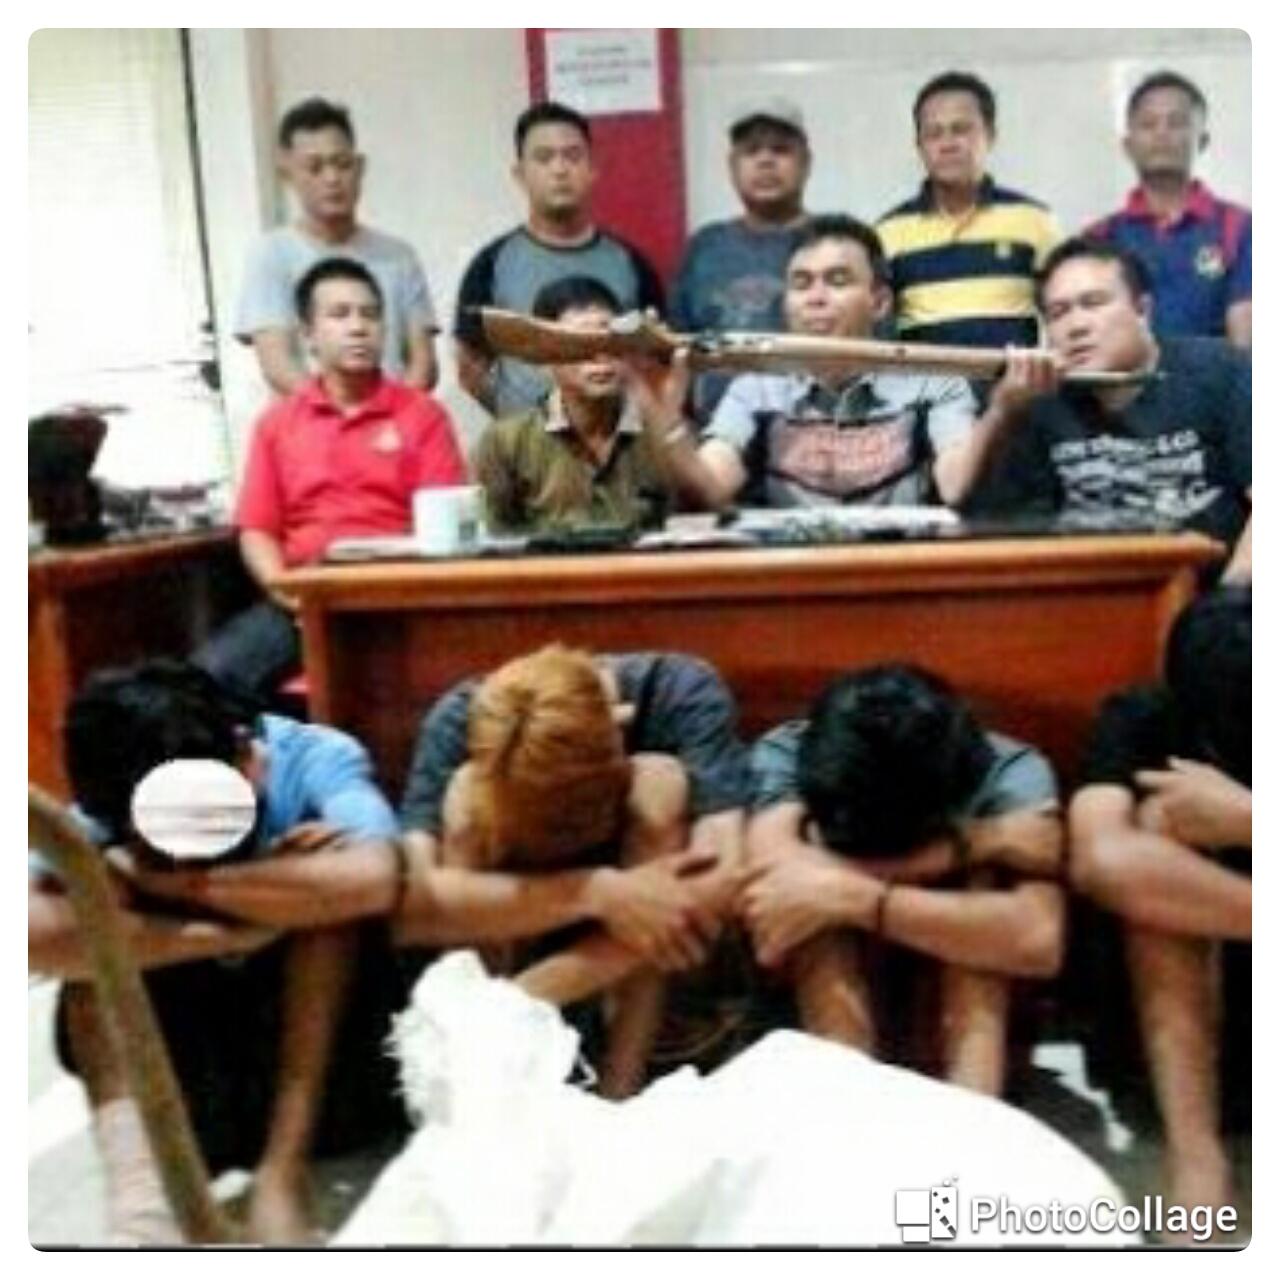 Tempo 6 Jam, Polisi Ungkap Pelaku Pembunuhan